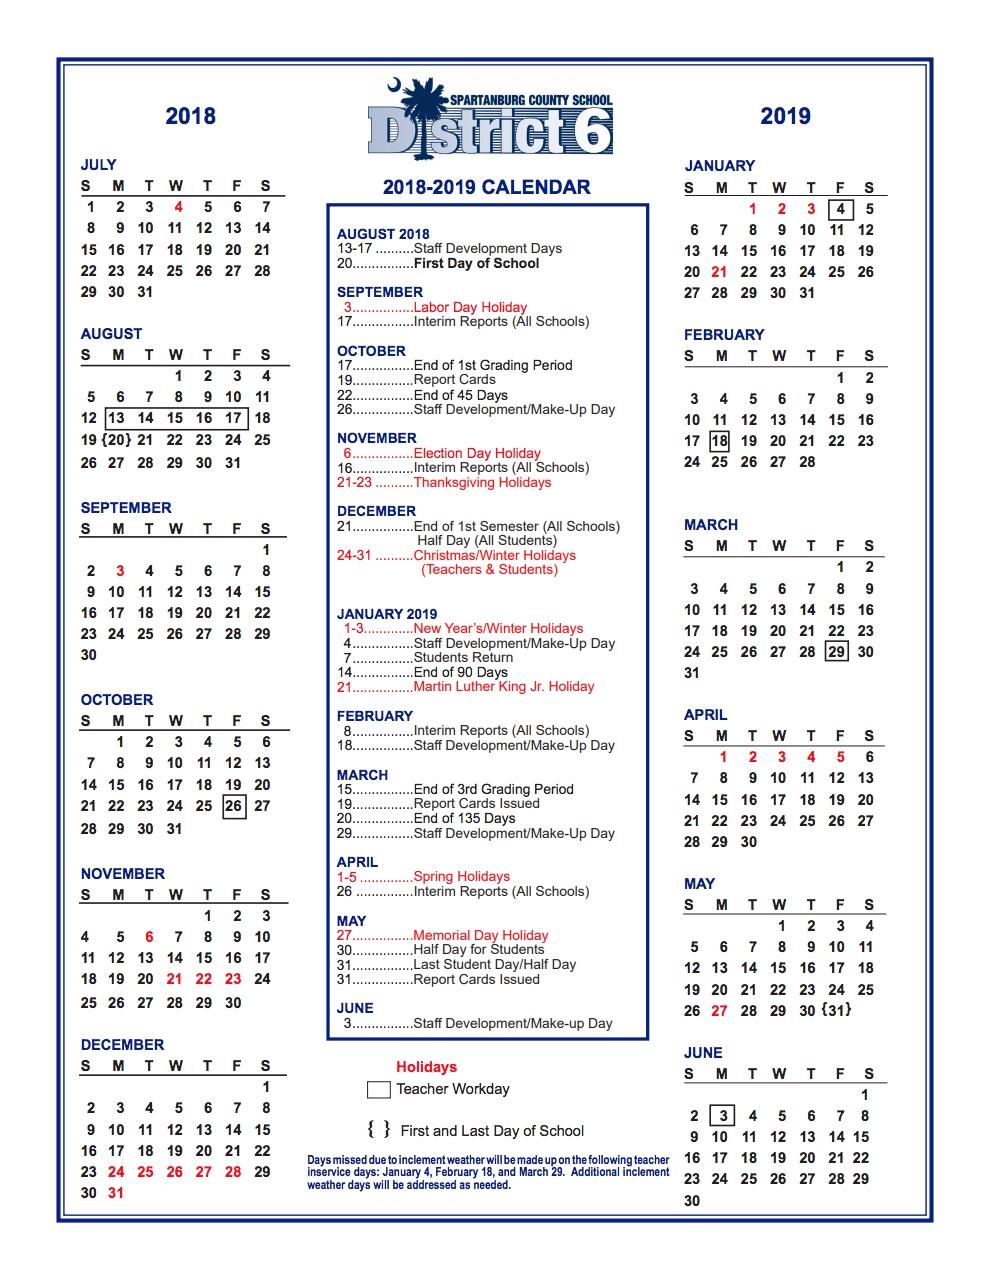 District Calendar – Parents – West View Elementary_Spartanburg District 6 School Calendar